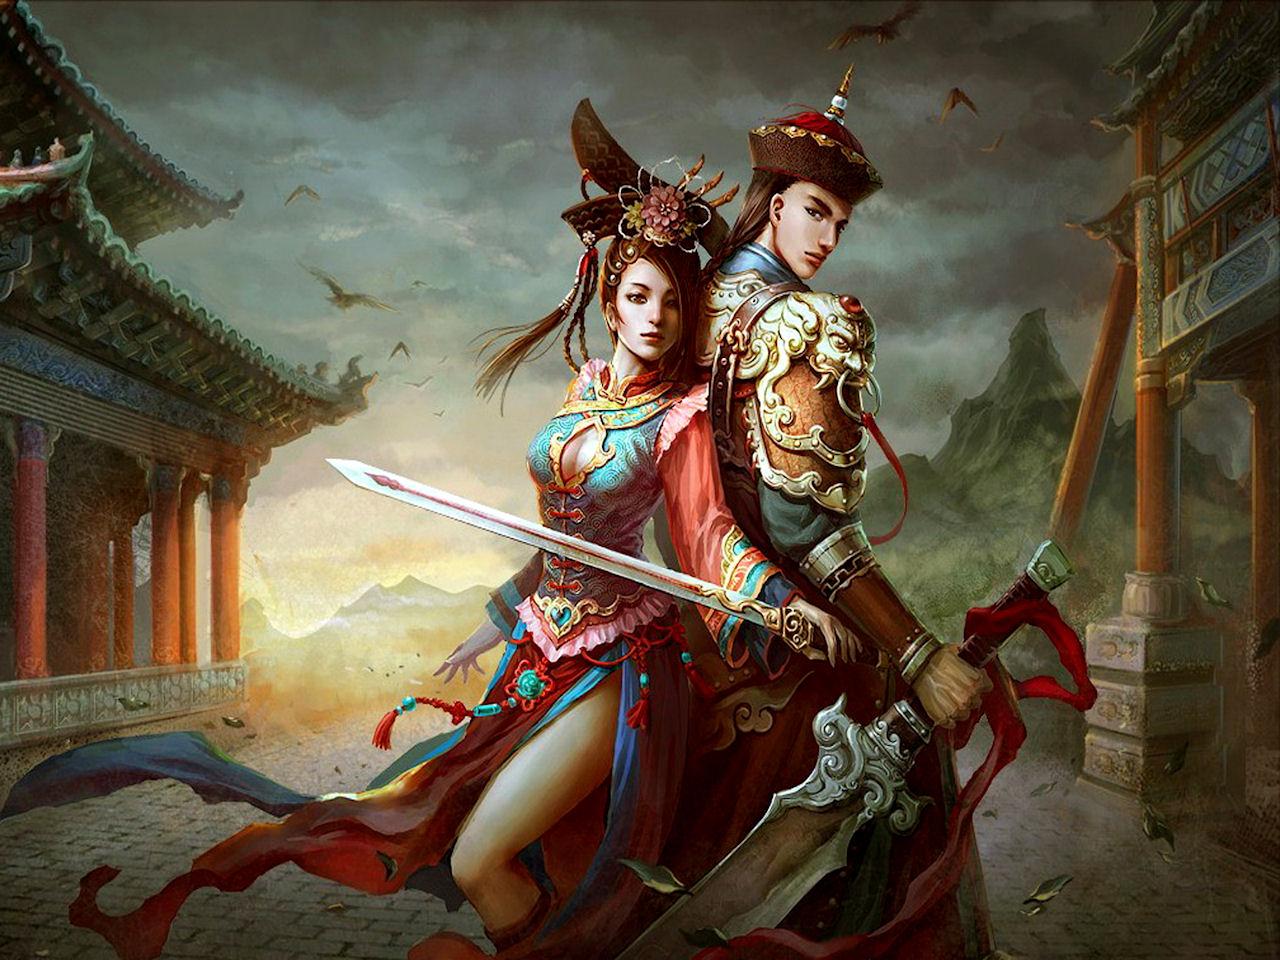 http://1.bp.blogspot.com/-g2r-uo_ZOXw/TpyAJTt1urI/AAAAAAAAnCQ/8JgTqGf_Gvg/s1600/www.BancodeImagenesGratuitas.com-wallpapers-13.jpg